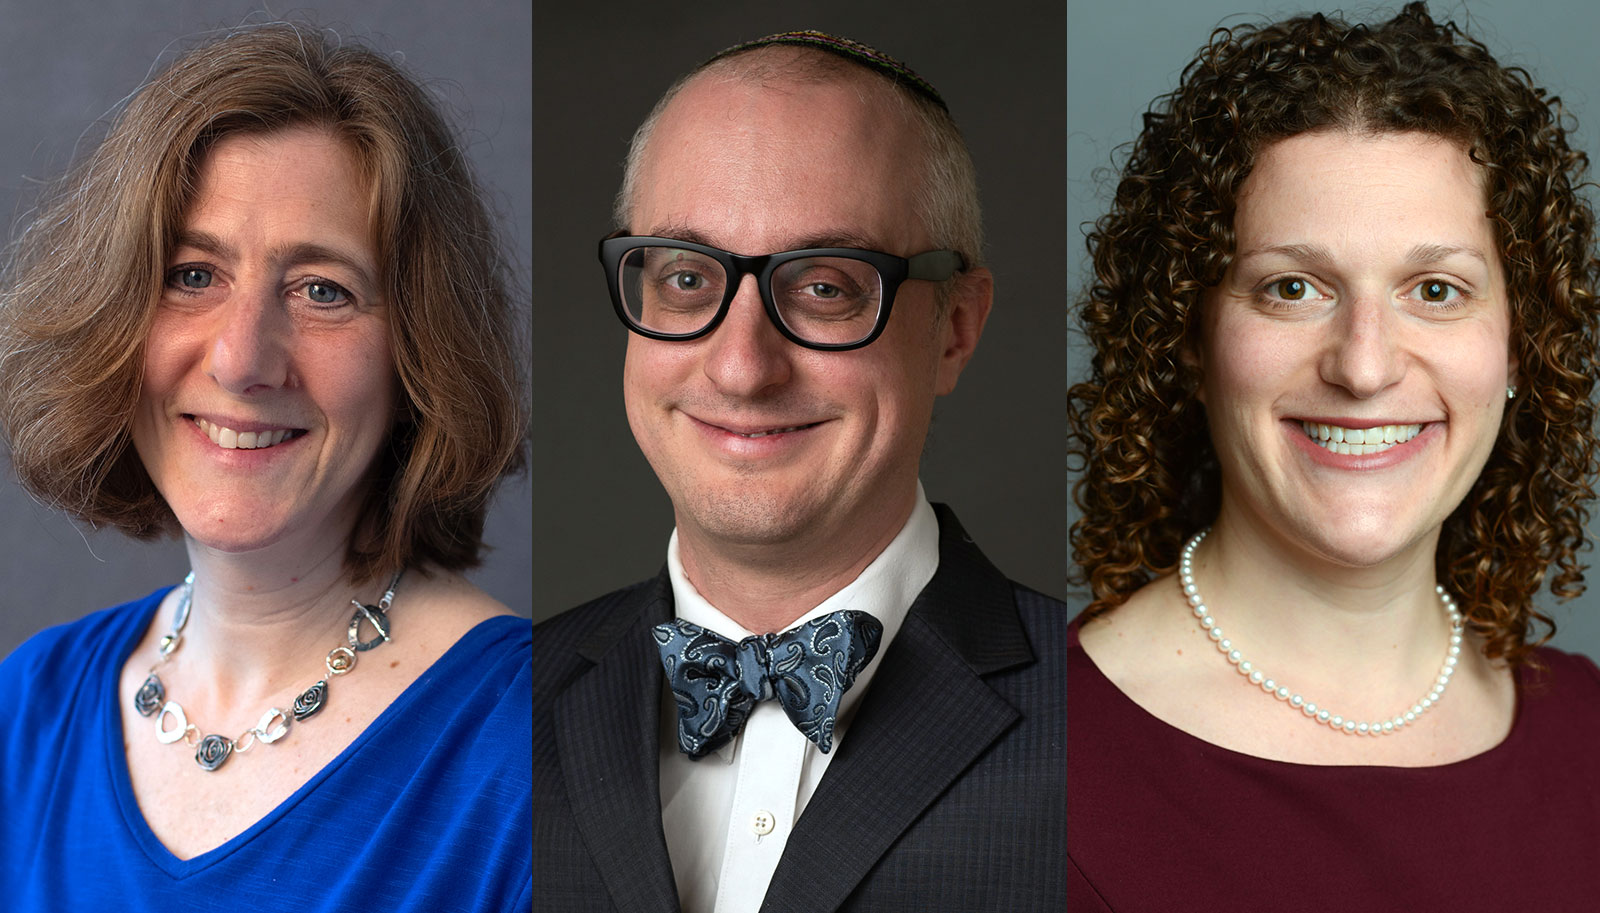 Maxine Segal Handelman, Russel M. Neiss, and Amanda Pogany Receive the 2020 Covenant Award at Virtual Celebration on Sunday